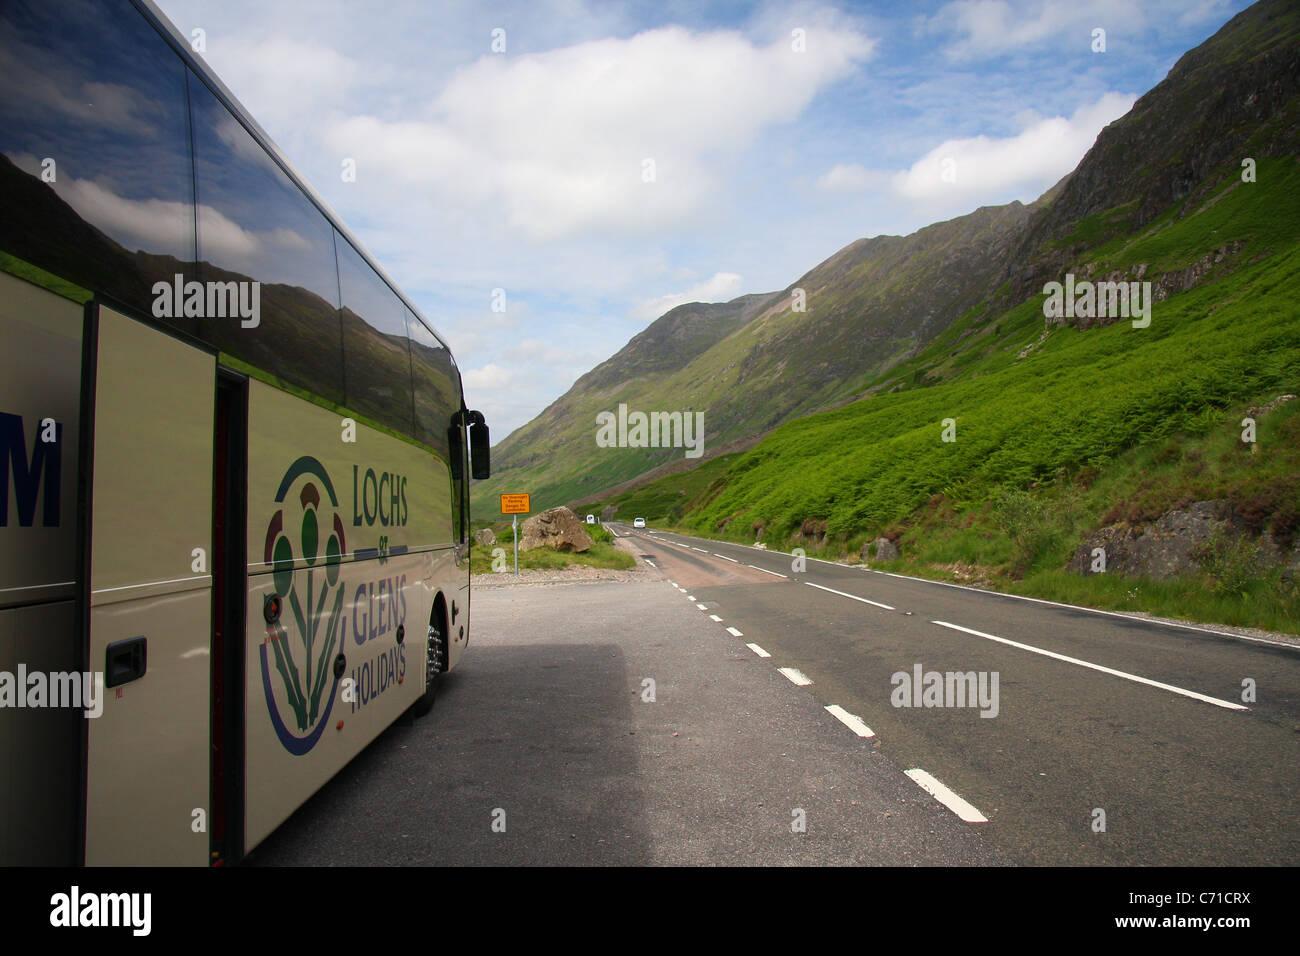 Lochs and Glens at Glencoe - Stock Image